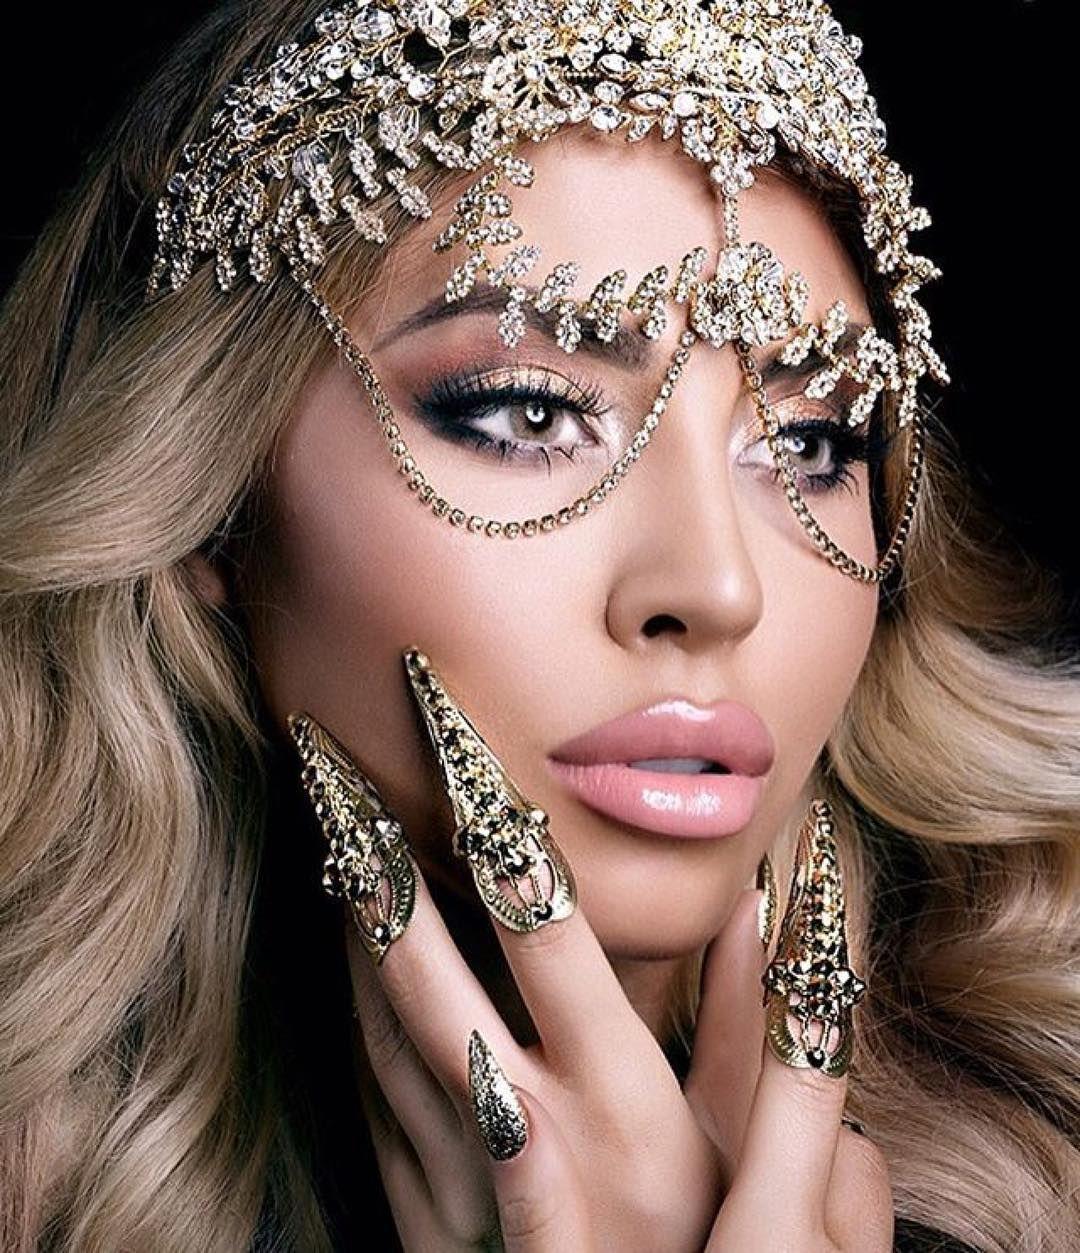 I ❤️to create! ☺️Disney,Lady Gaga,Nicki Minaj,Pink,Beyonce ...